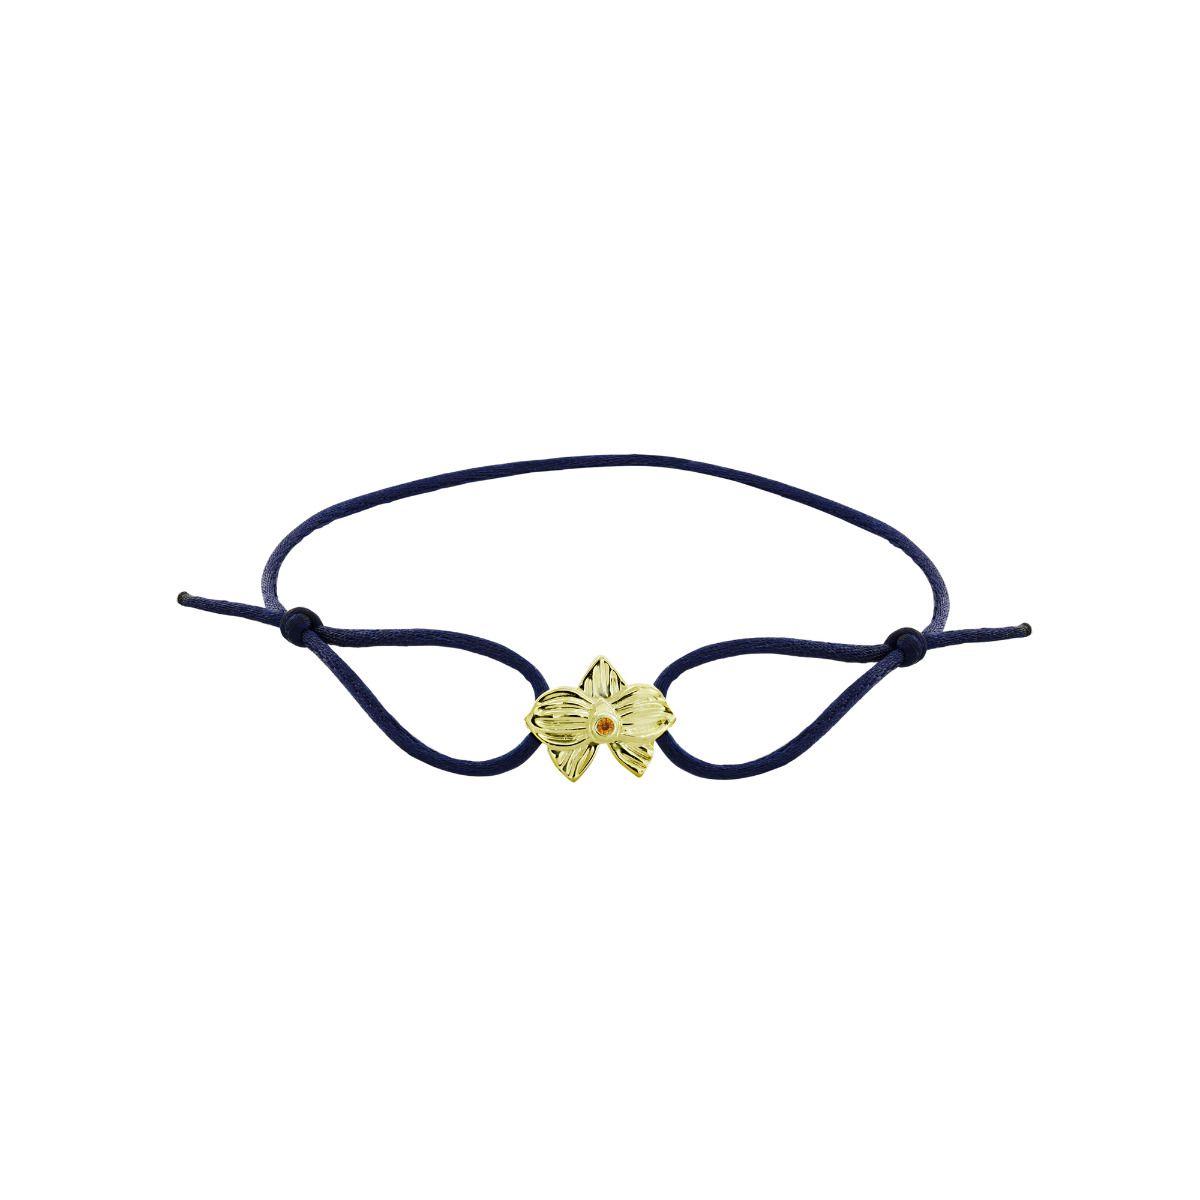 Allyn's Orchard 14k Yellow Gold Blue Silk Cord Bracelet